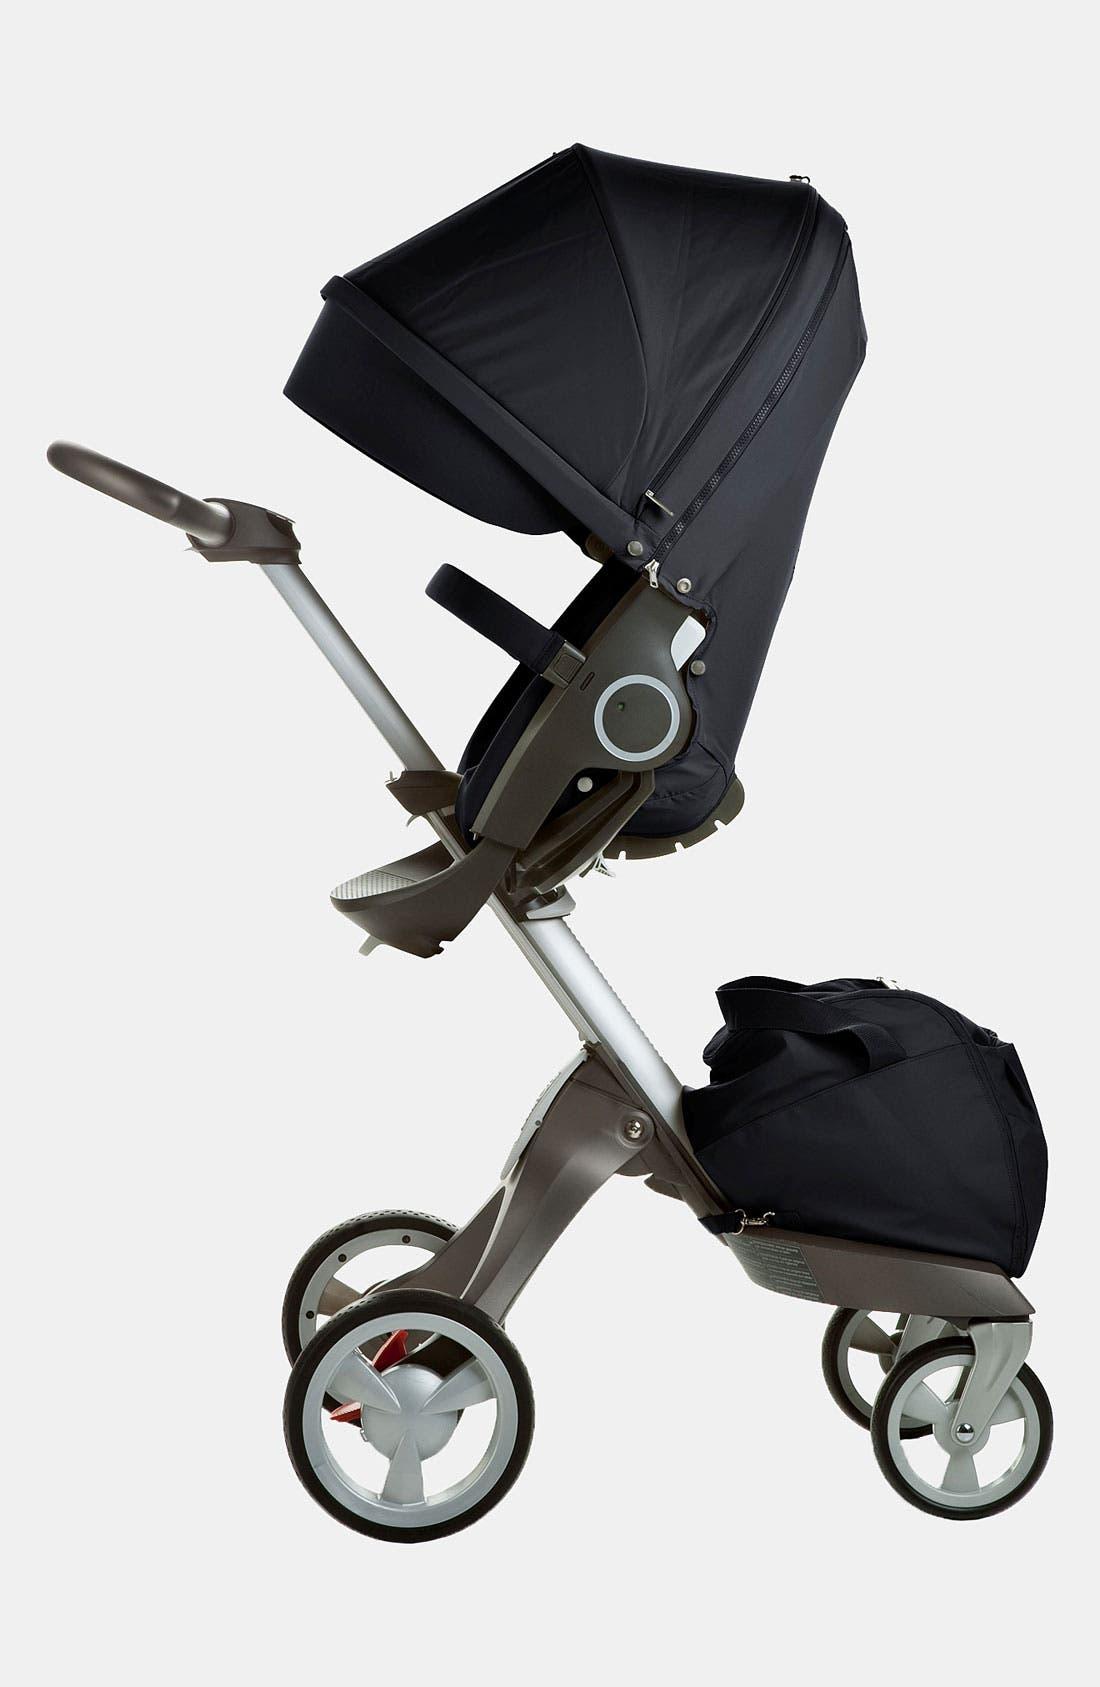 Alternate Image 1 Selected - Stokke 'Xplory®' Stroller